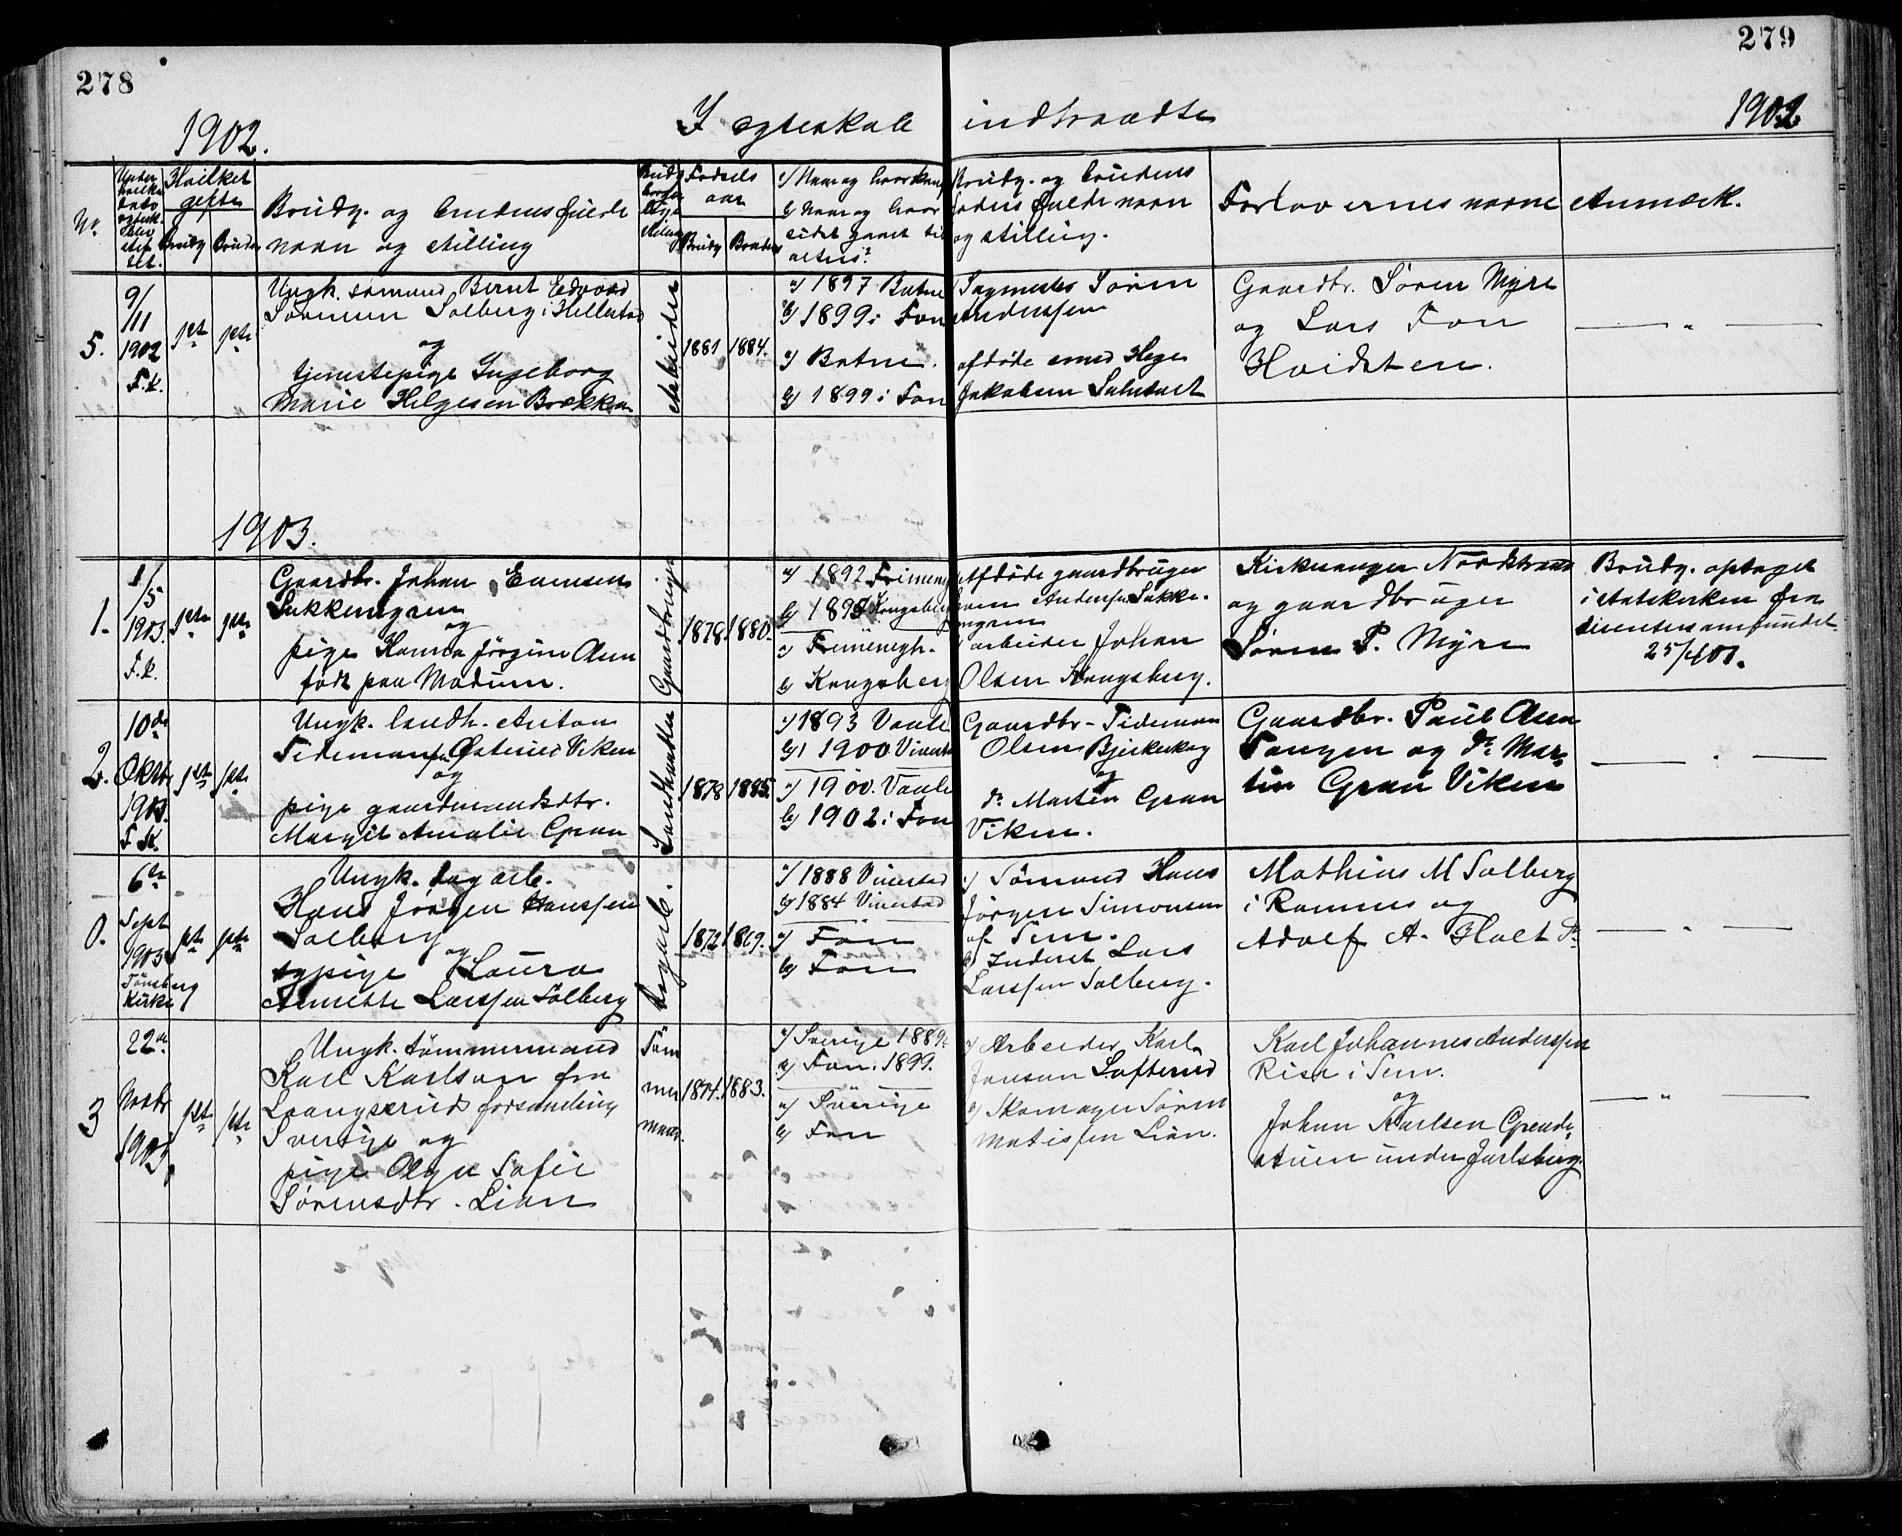 SAKO, Ramnes kirkebøker, G/Gb/L0001: Klokkerbok nr. II 1, 1869-1904, s. 278-279